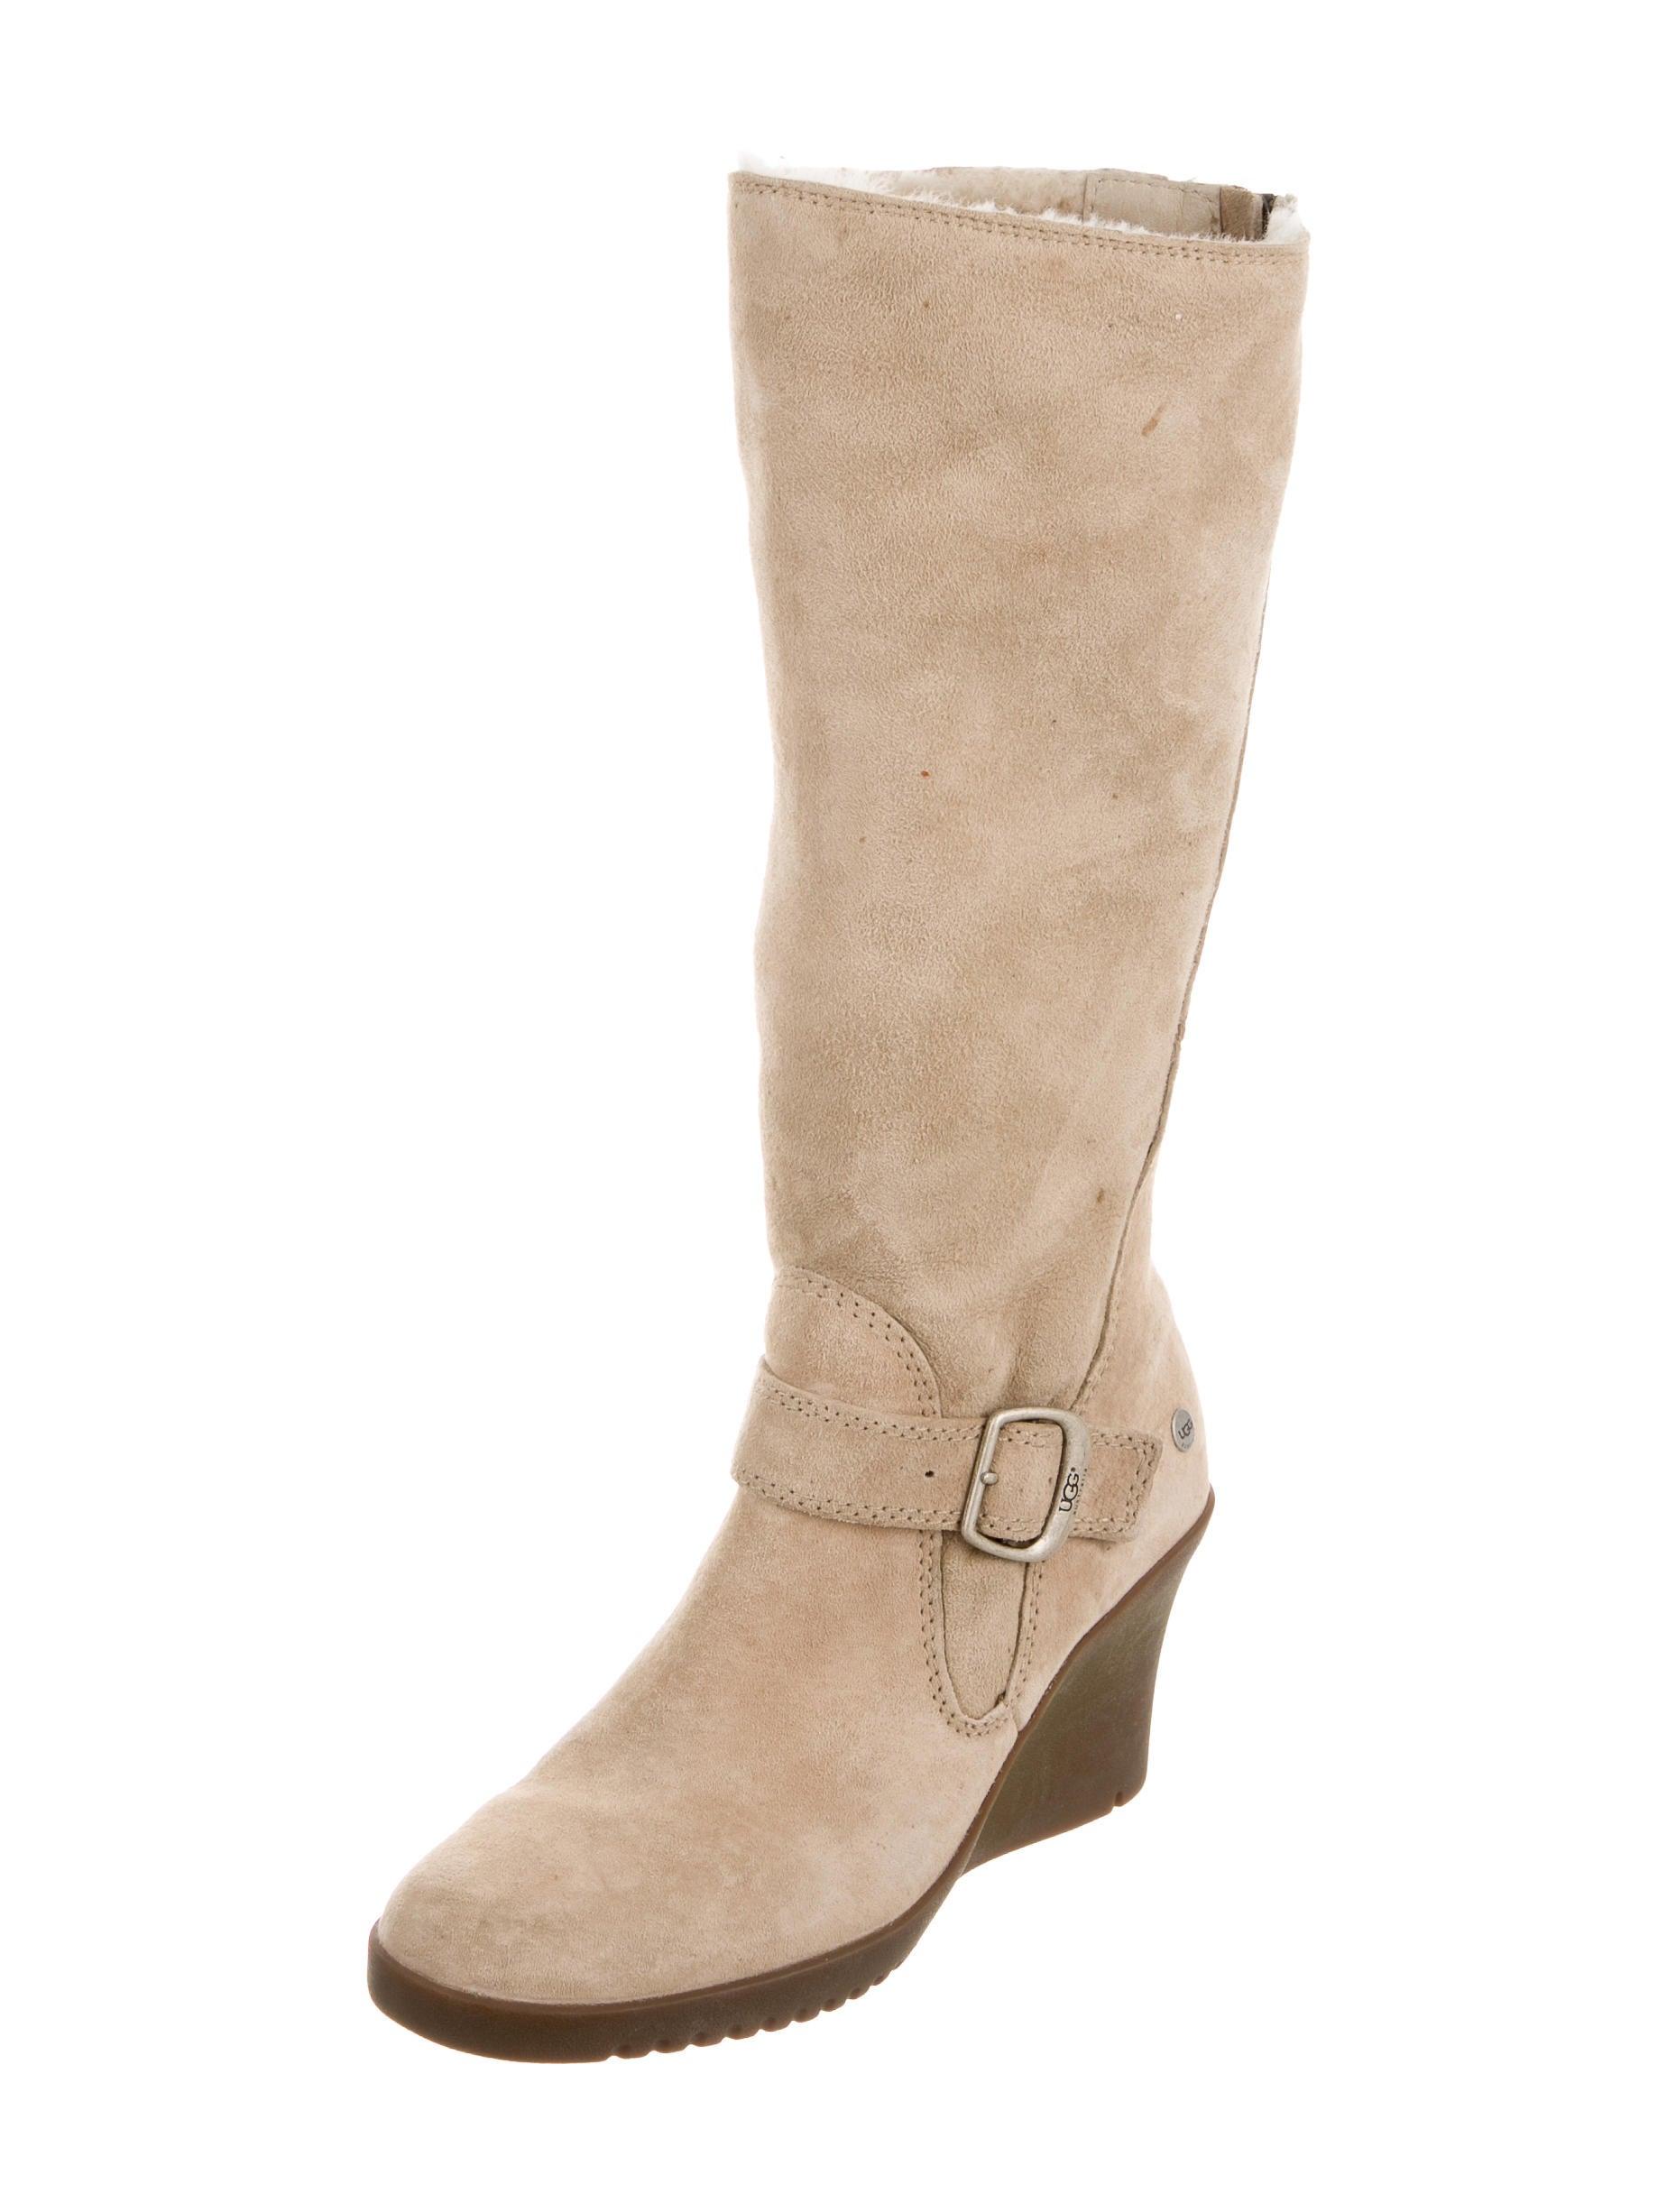 ugg australia shearling wedge boots shoes wuugg21116